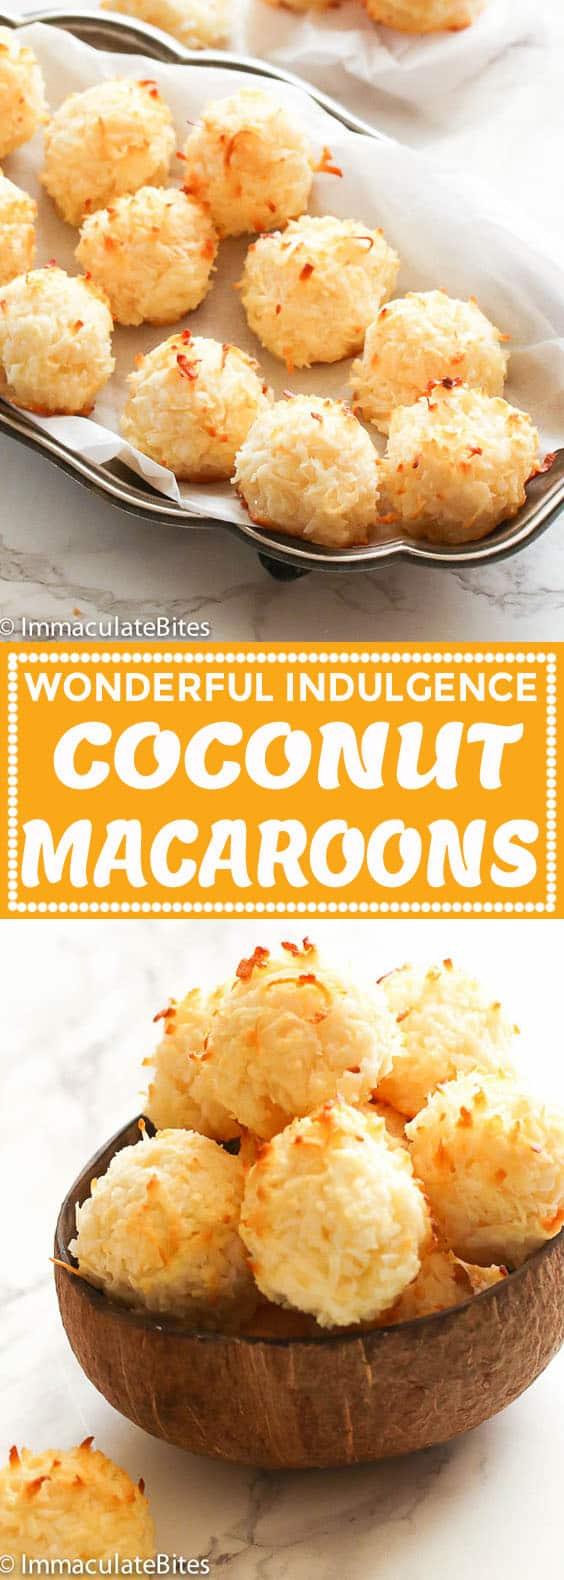 Coconut Macaroons.2